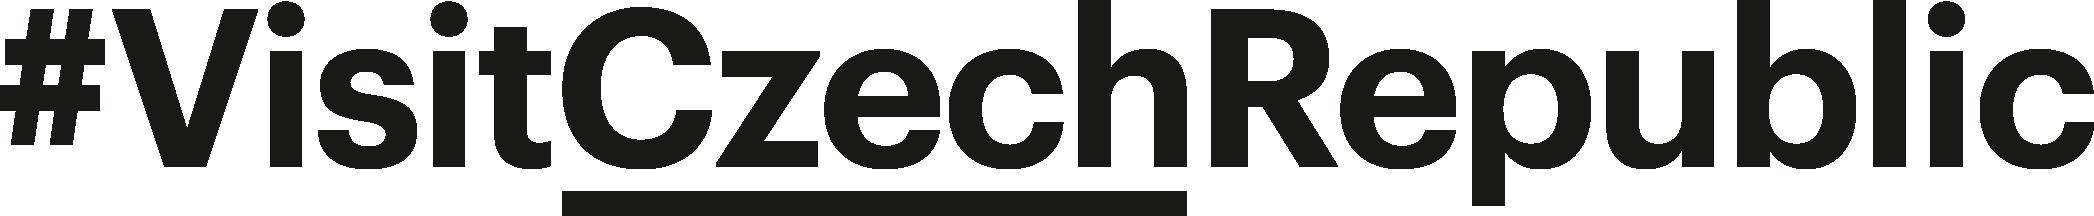 VisitCzechRepublic